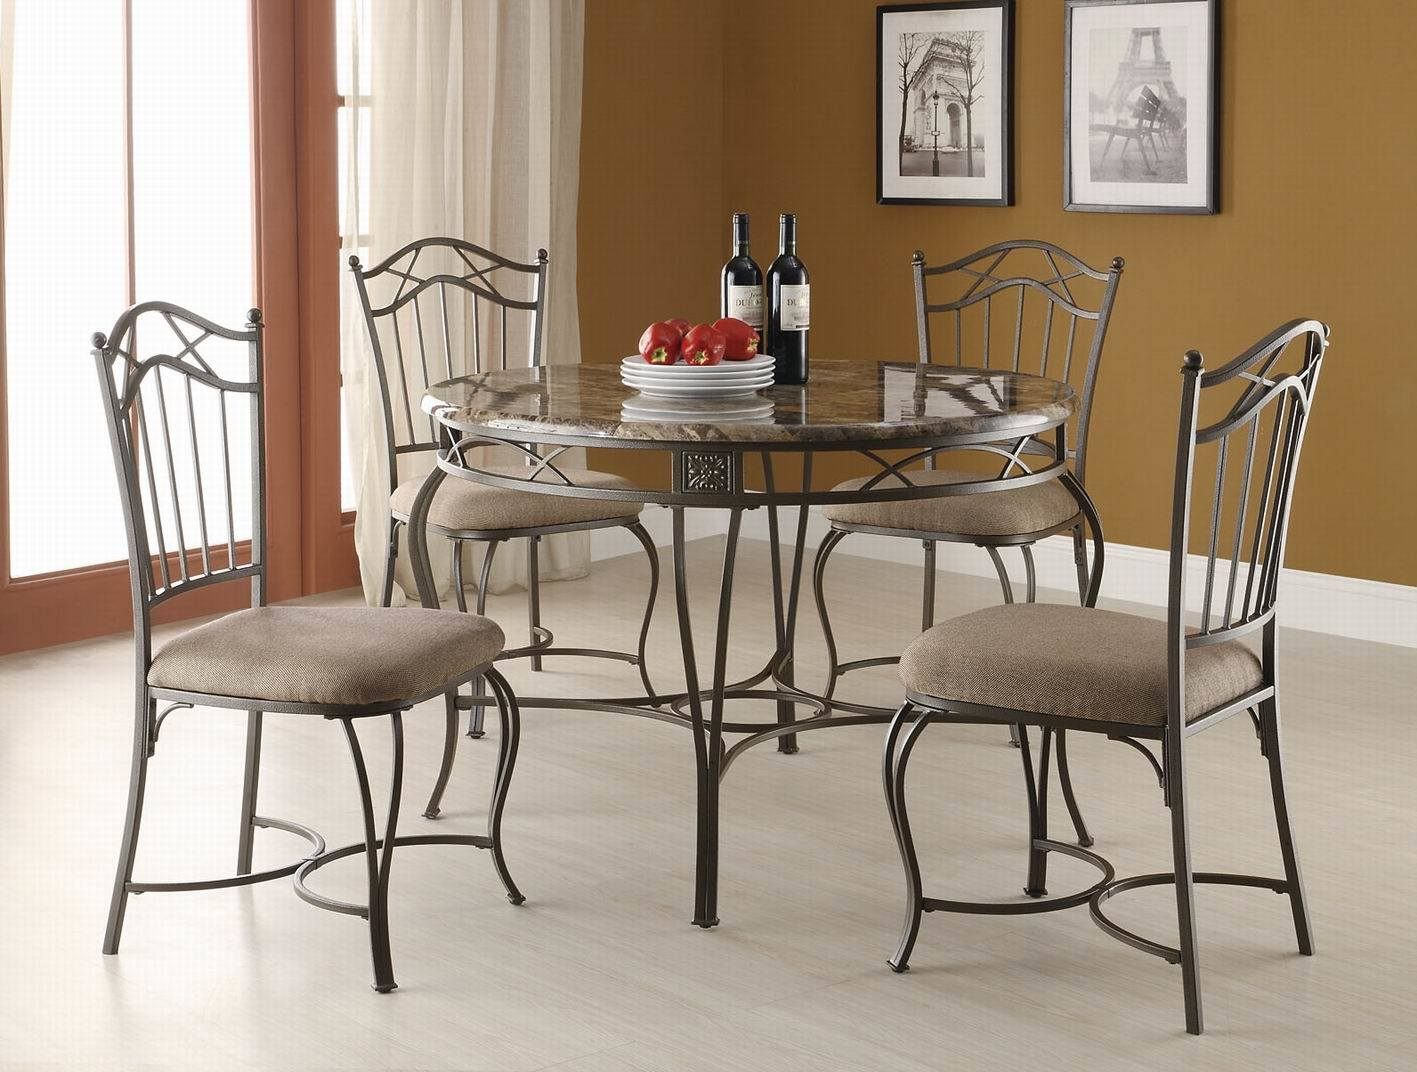 101217 Powder Coating Paint Dining Furniture